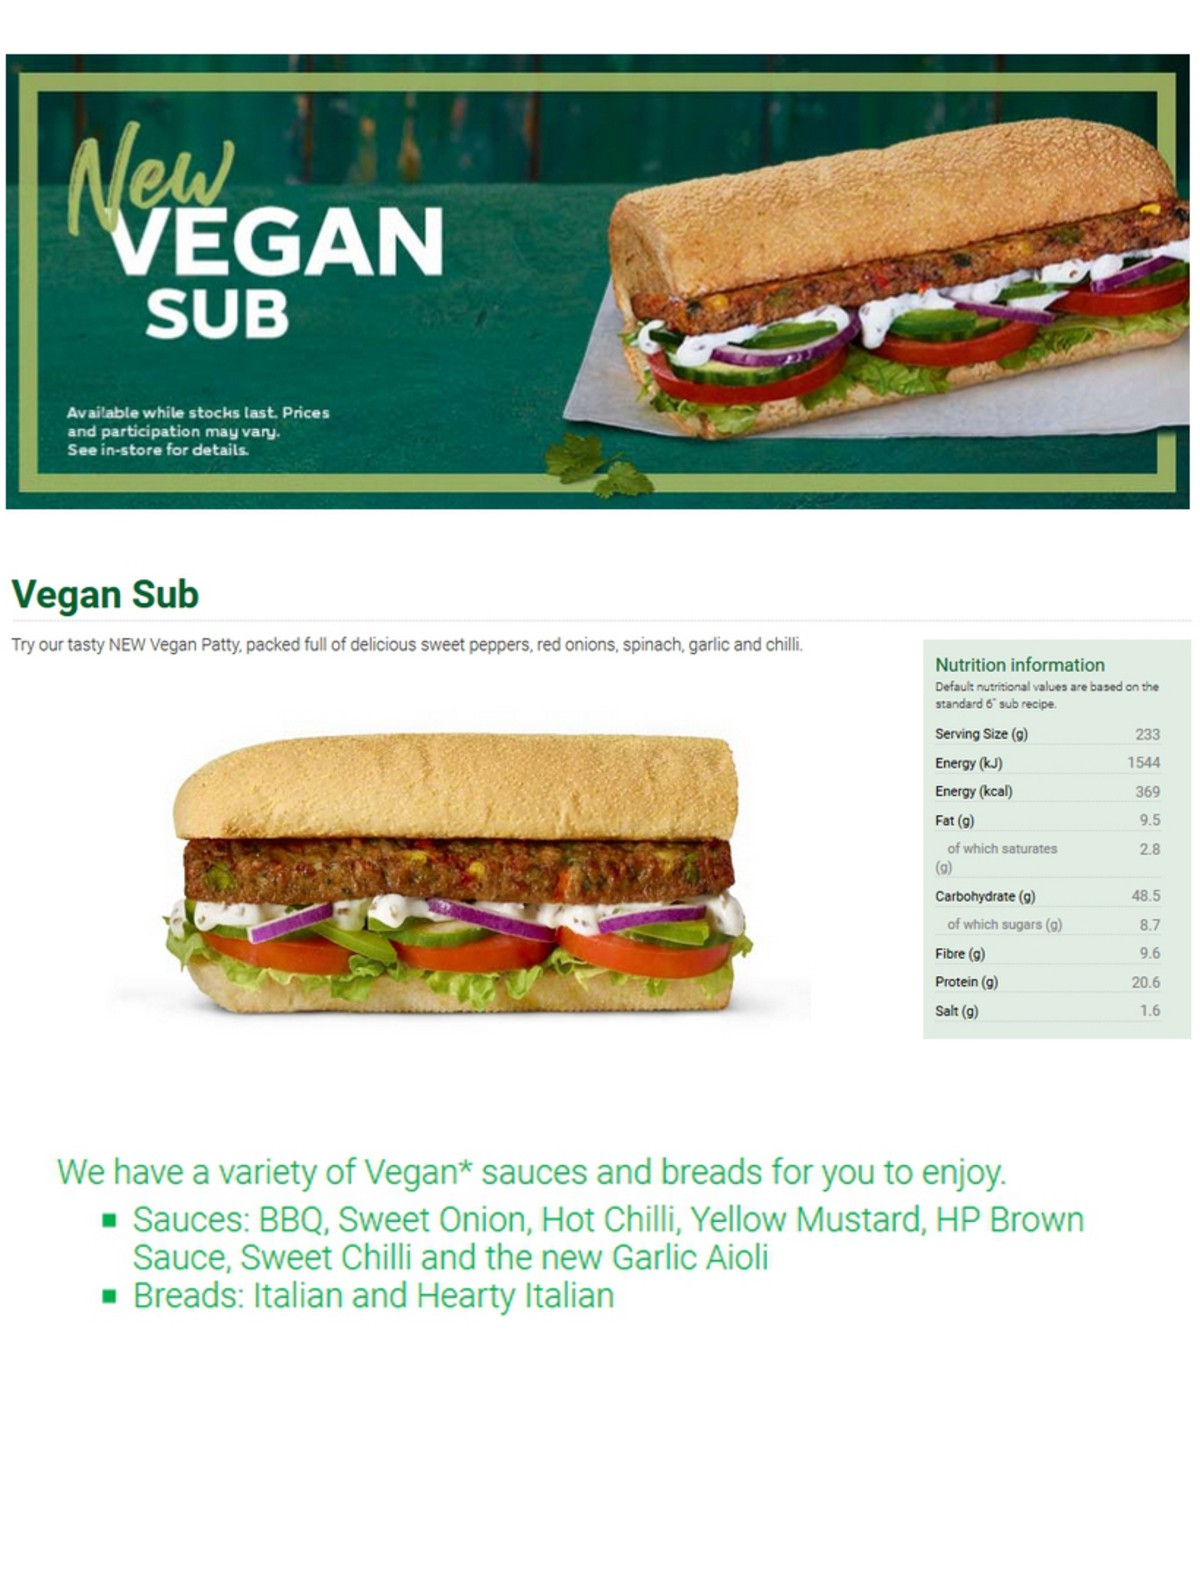 SUBWAY Vegan Offers & Menu for April 1 - Page 2